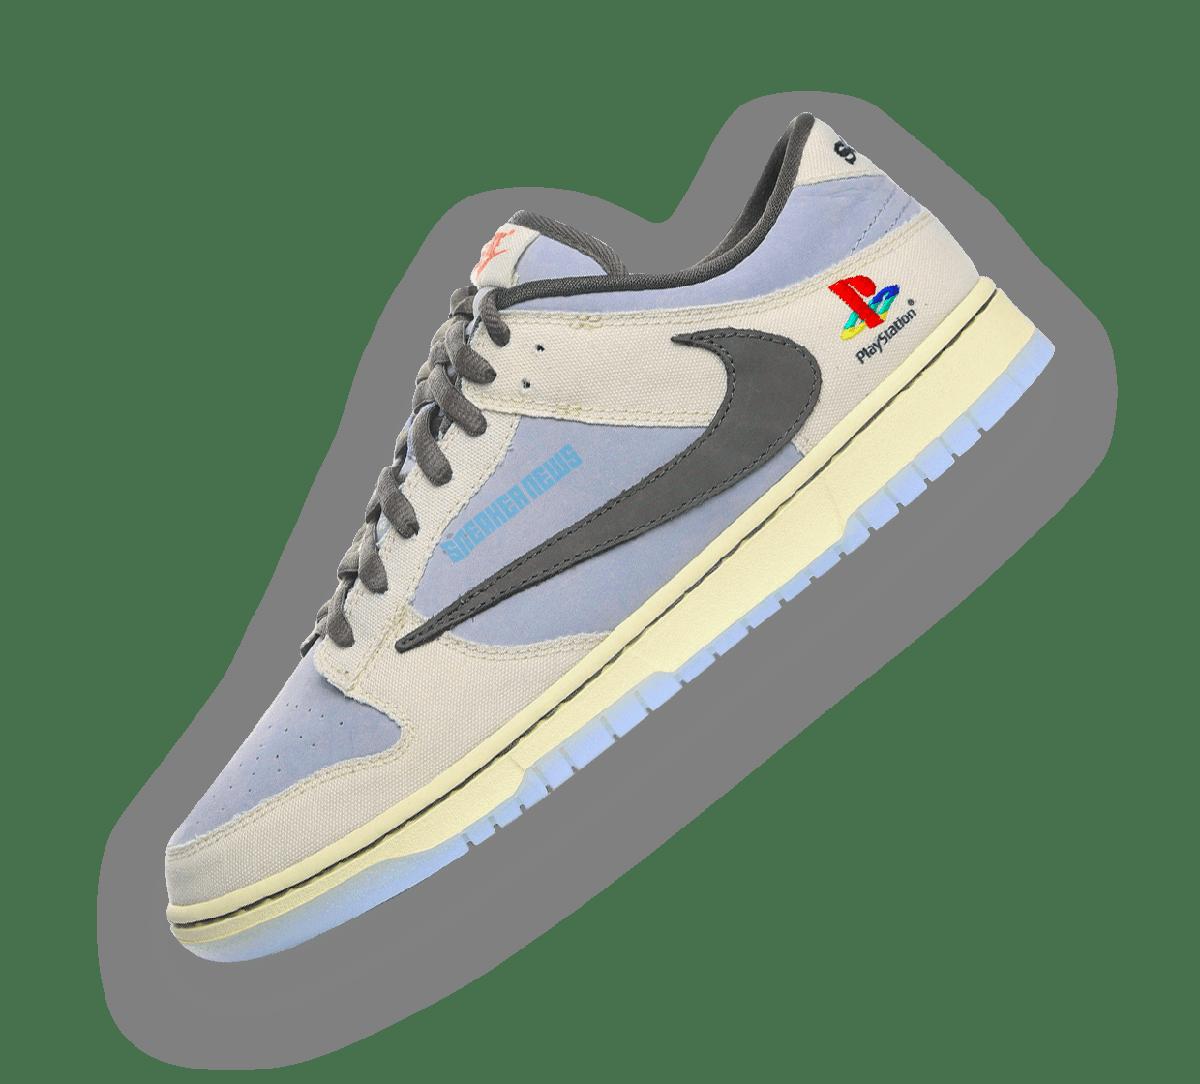 Nike Dunk Low Travis Scott x Playstation Image